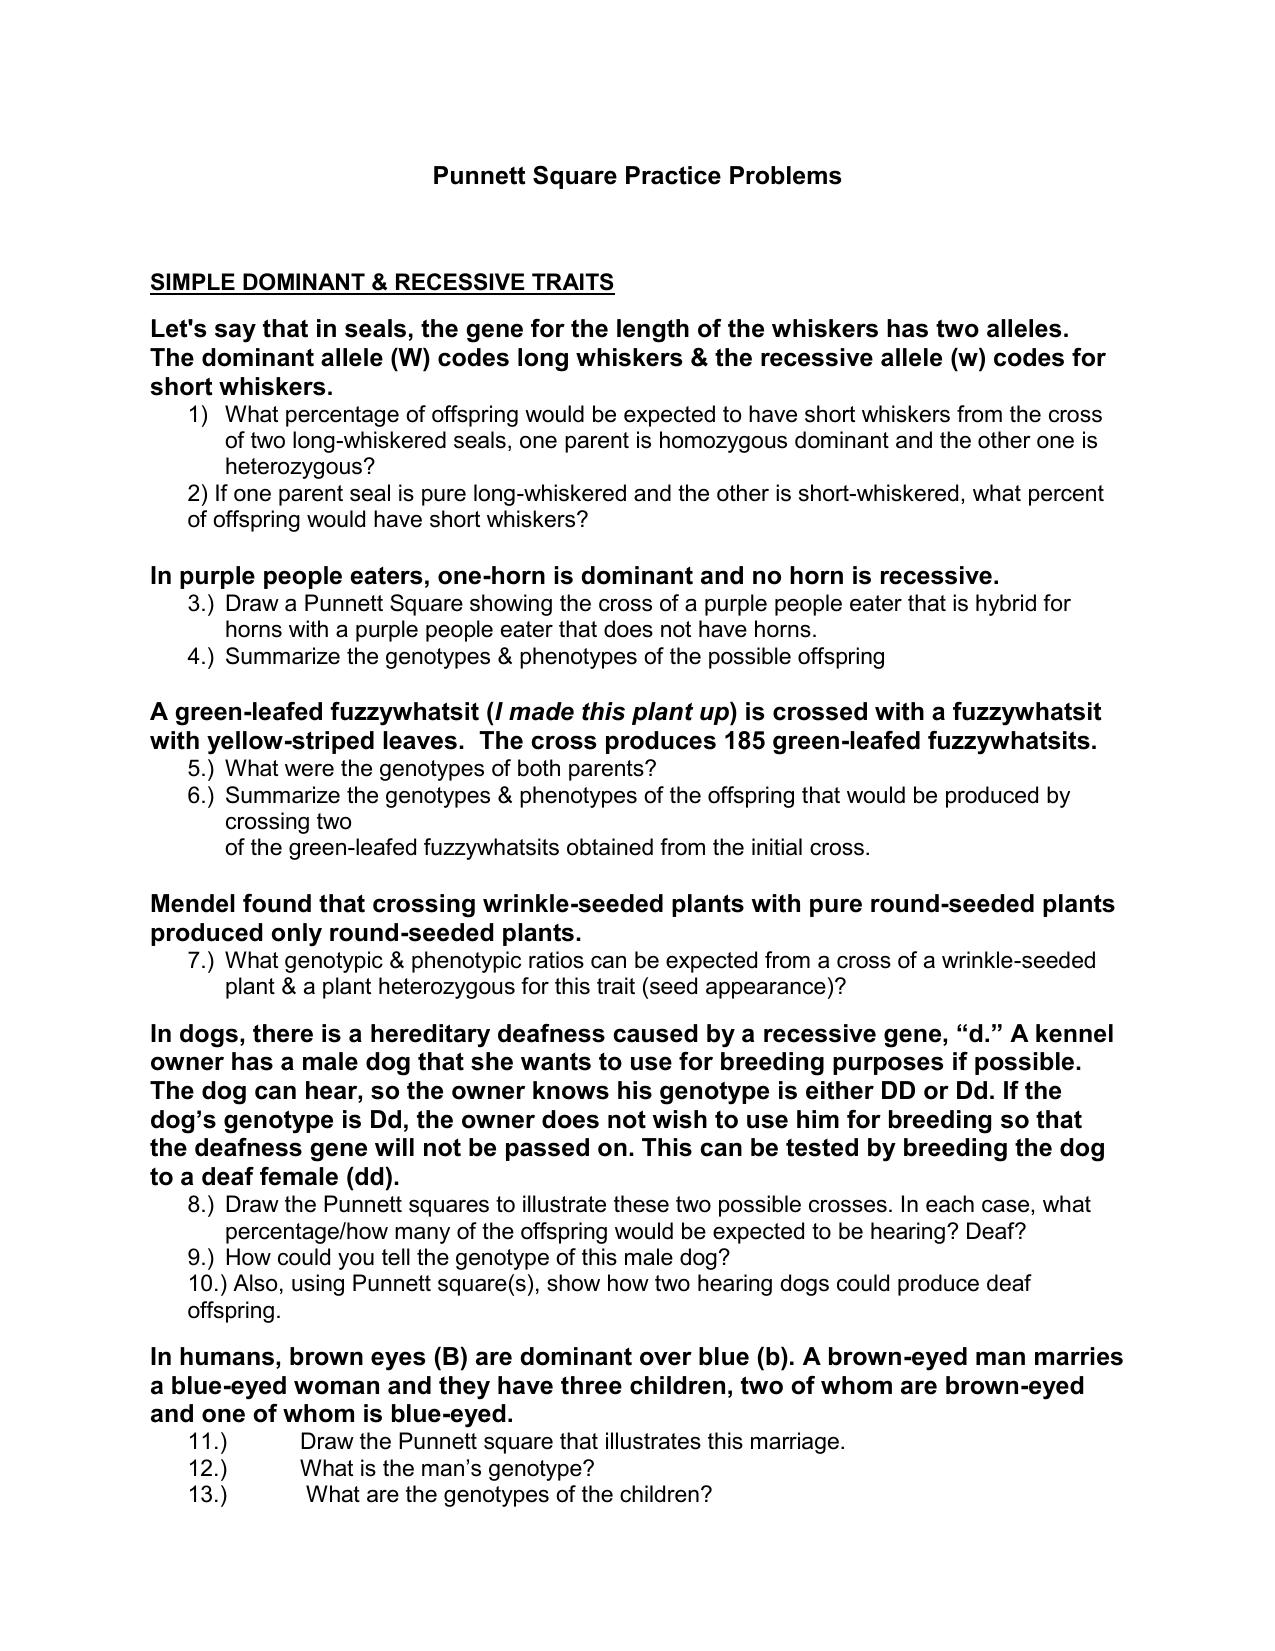 Punnett Square Practice Problems Intended For Punnett Square Practice Problems Worksheet